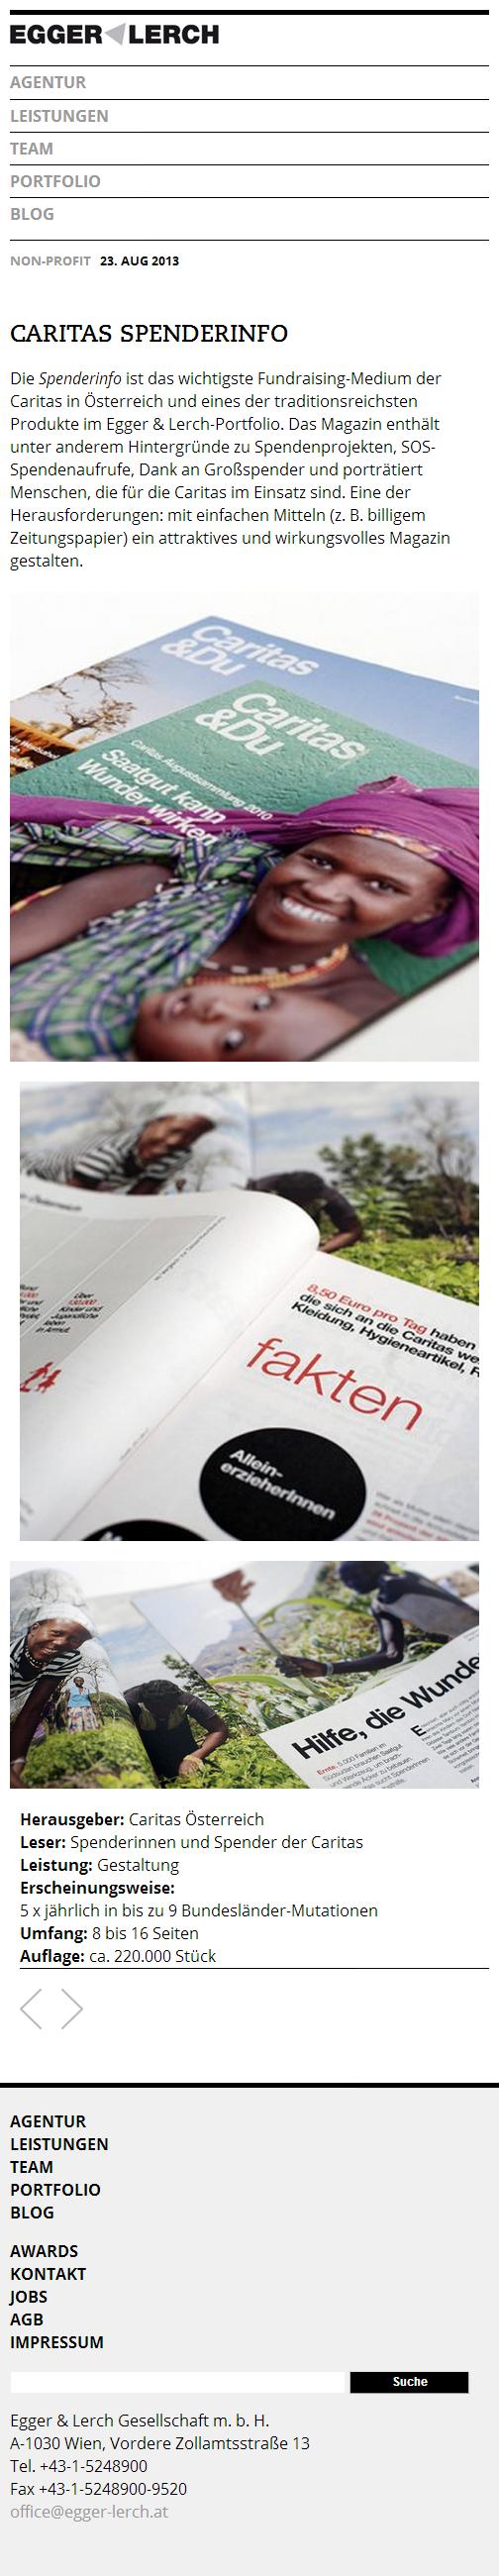 Egger & Lerch - Corporate Publishing - Mobile Screenshot Magazine Details